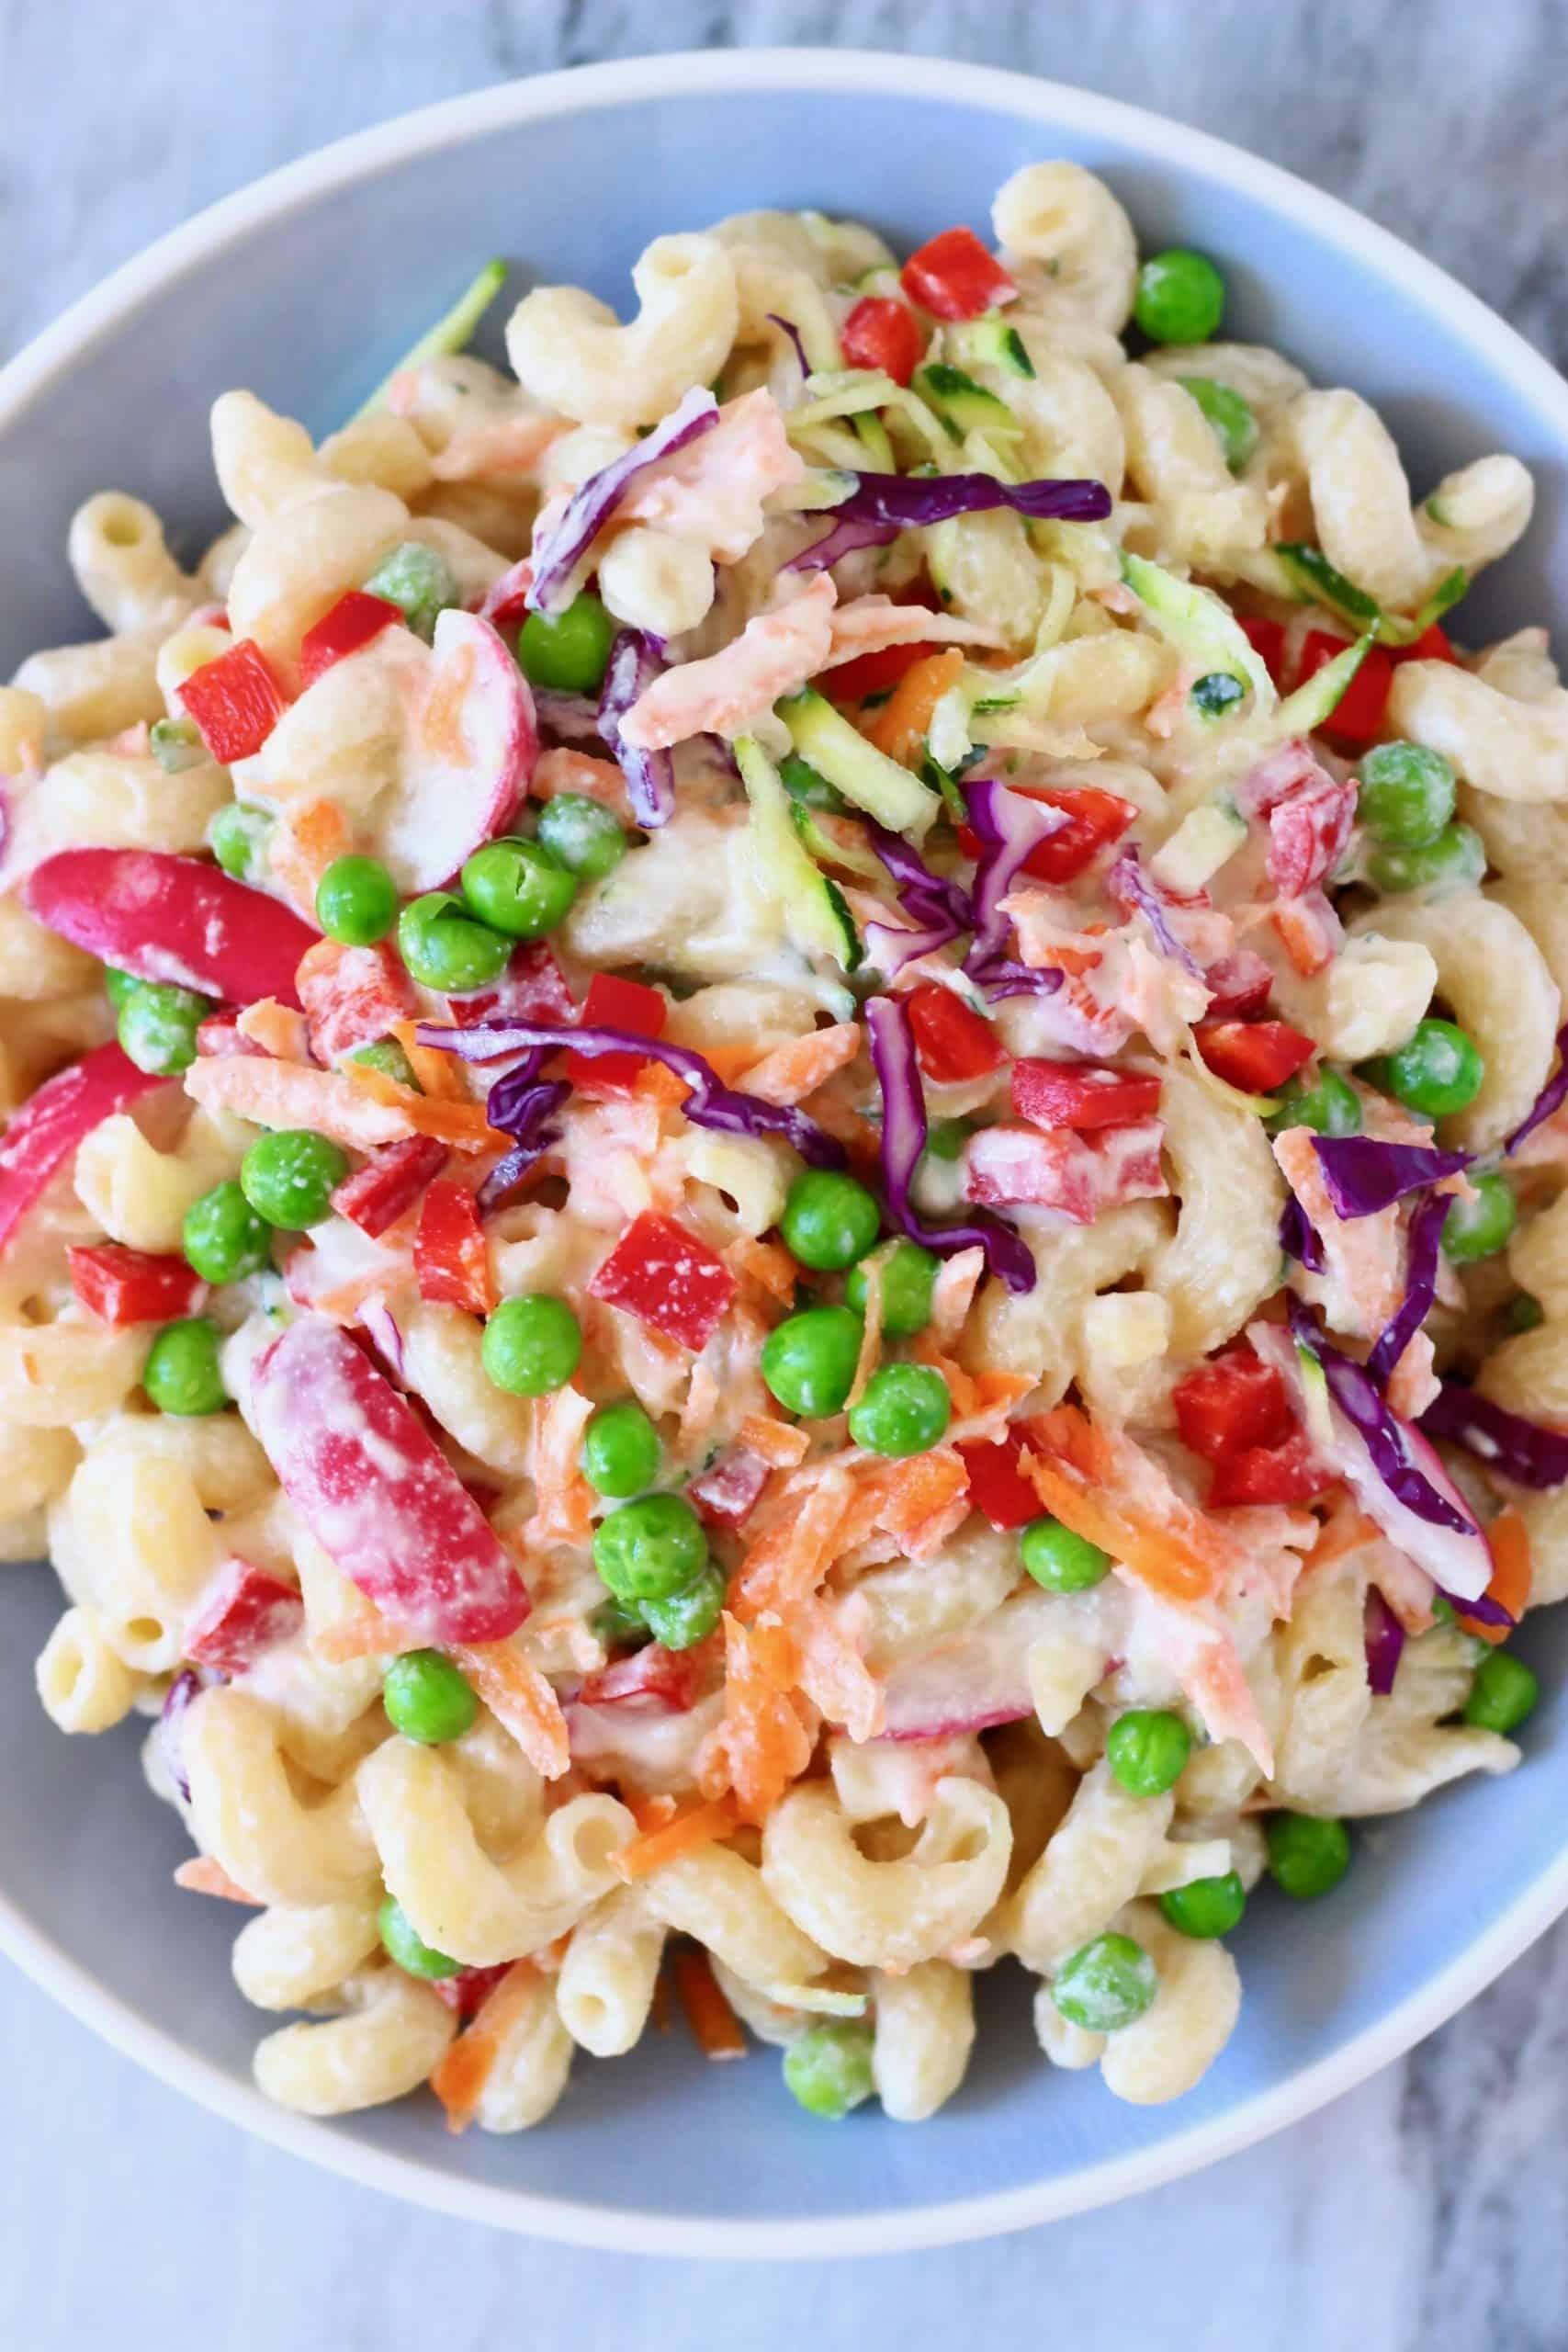 Vegan rainbow macaroni salad in a blue bowl